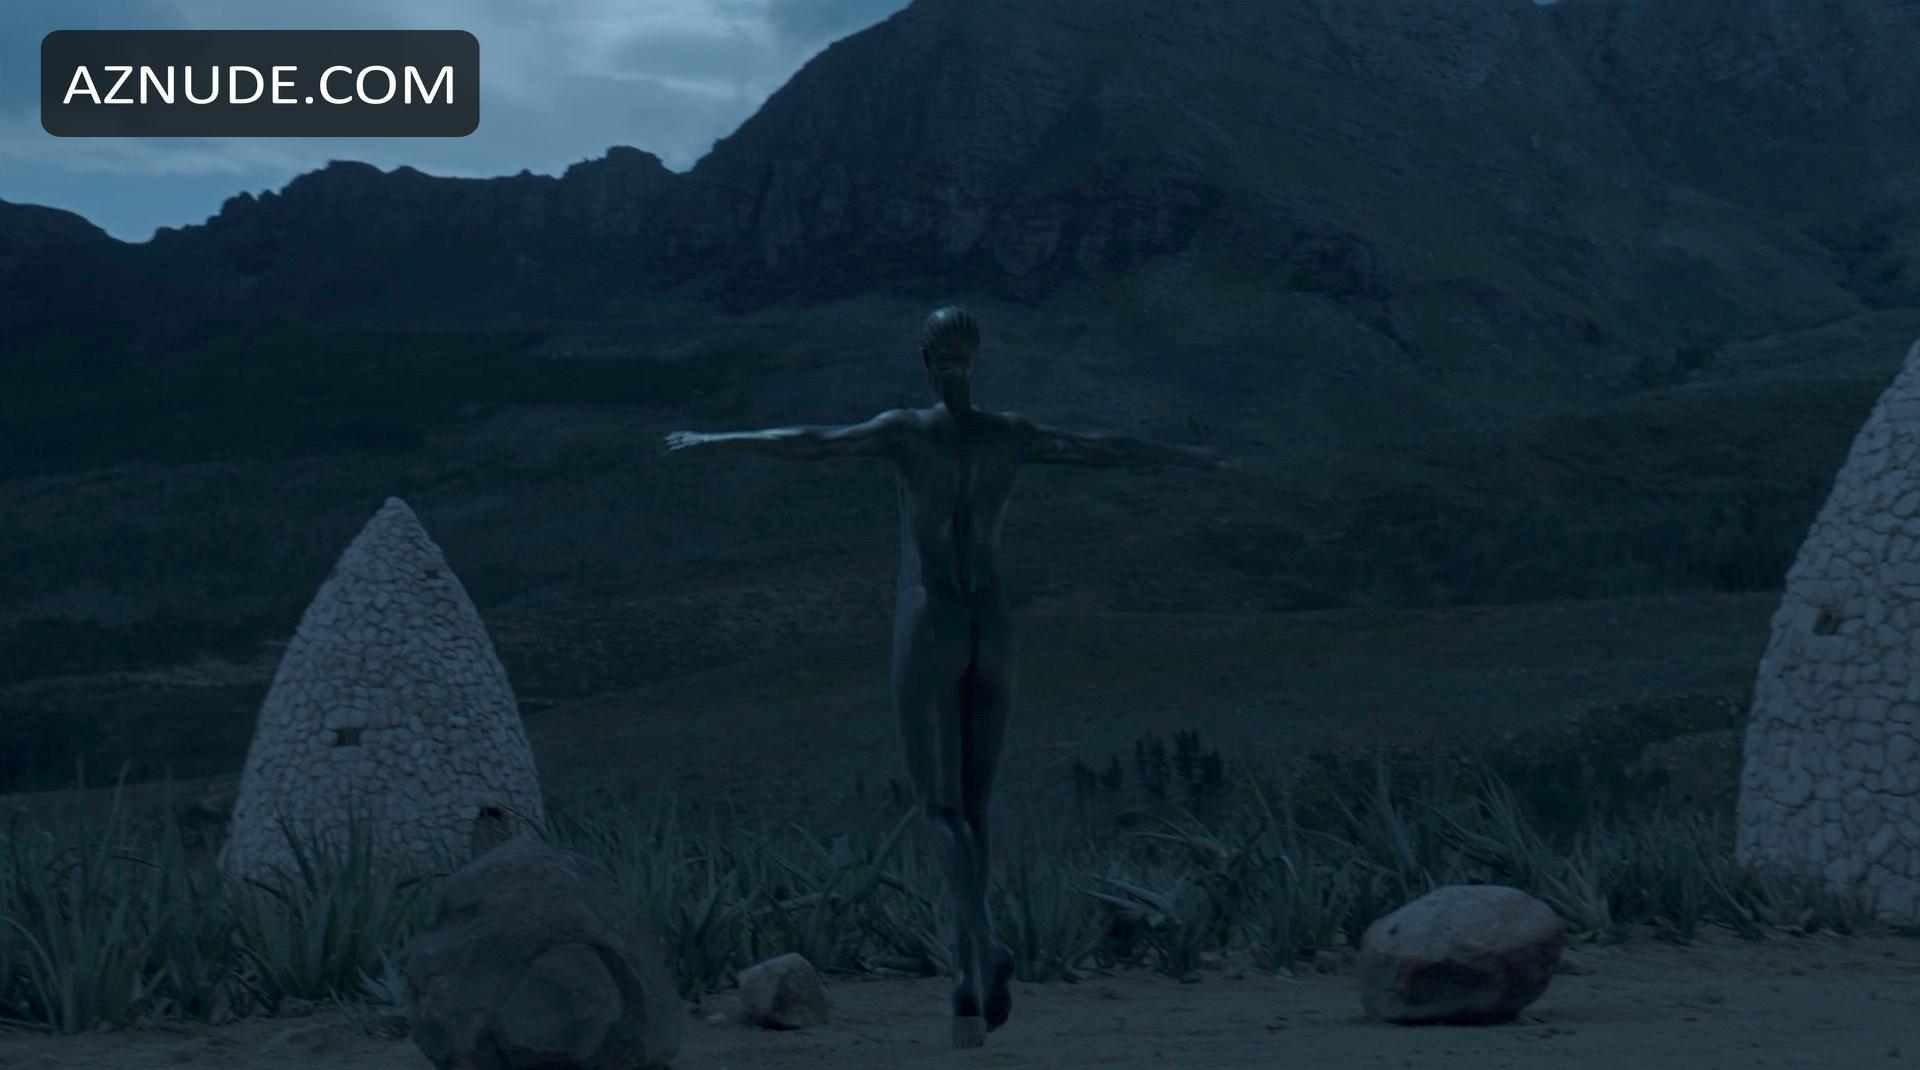 Collin nackt Amanda  Nudity in